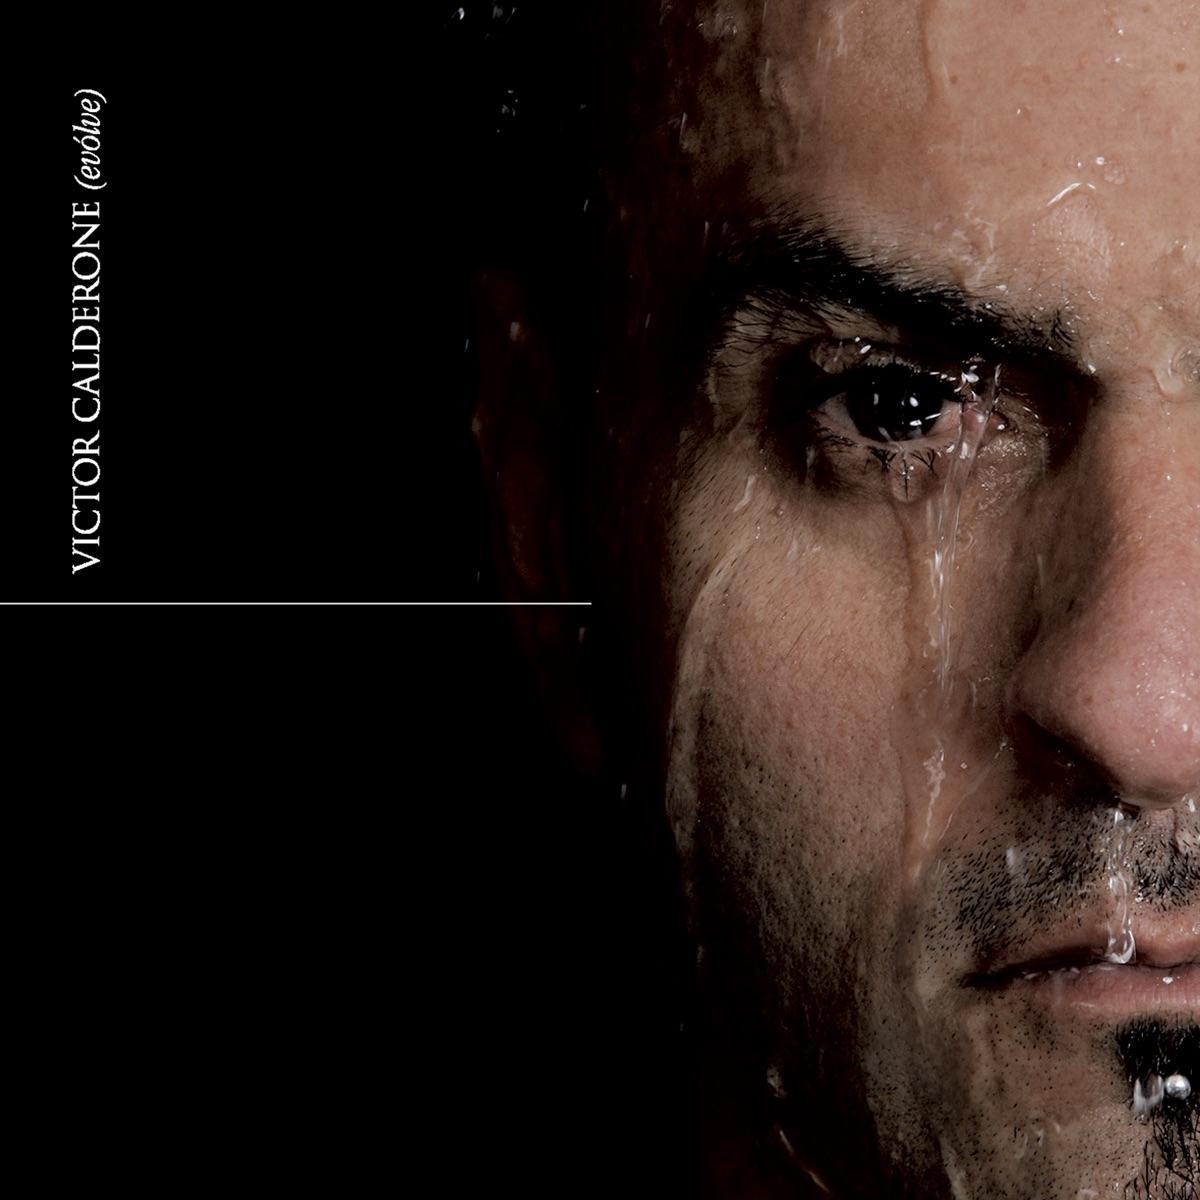 Evolve Victor Calderone CD cover